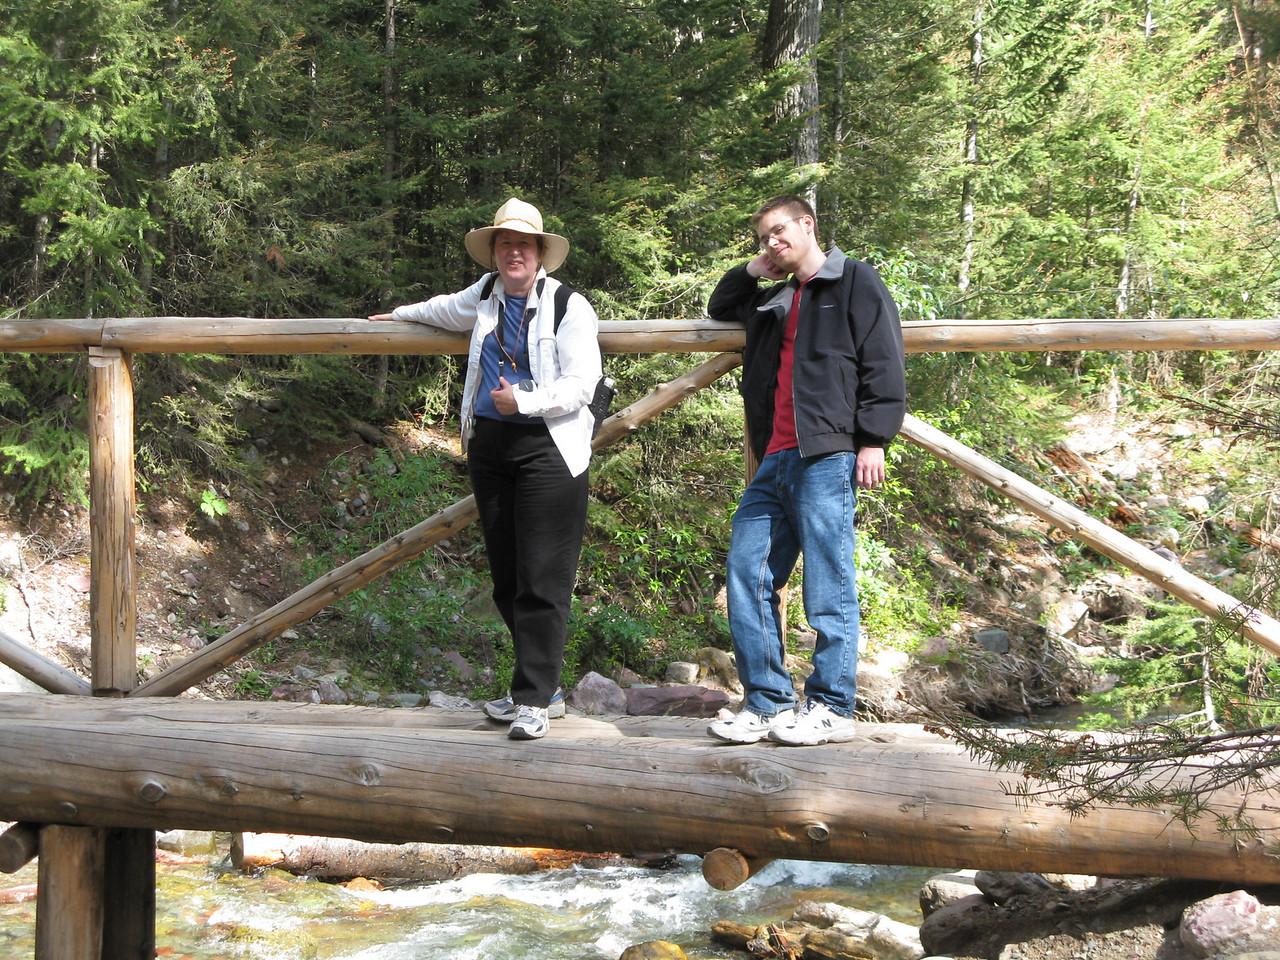 Mary and Kevin on the narrow log bridge.